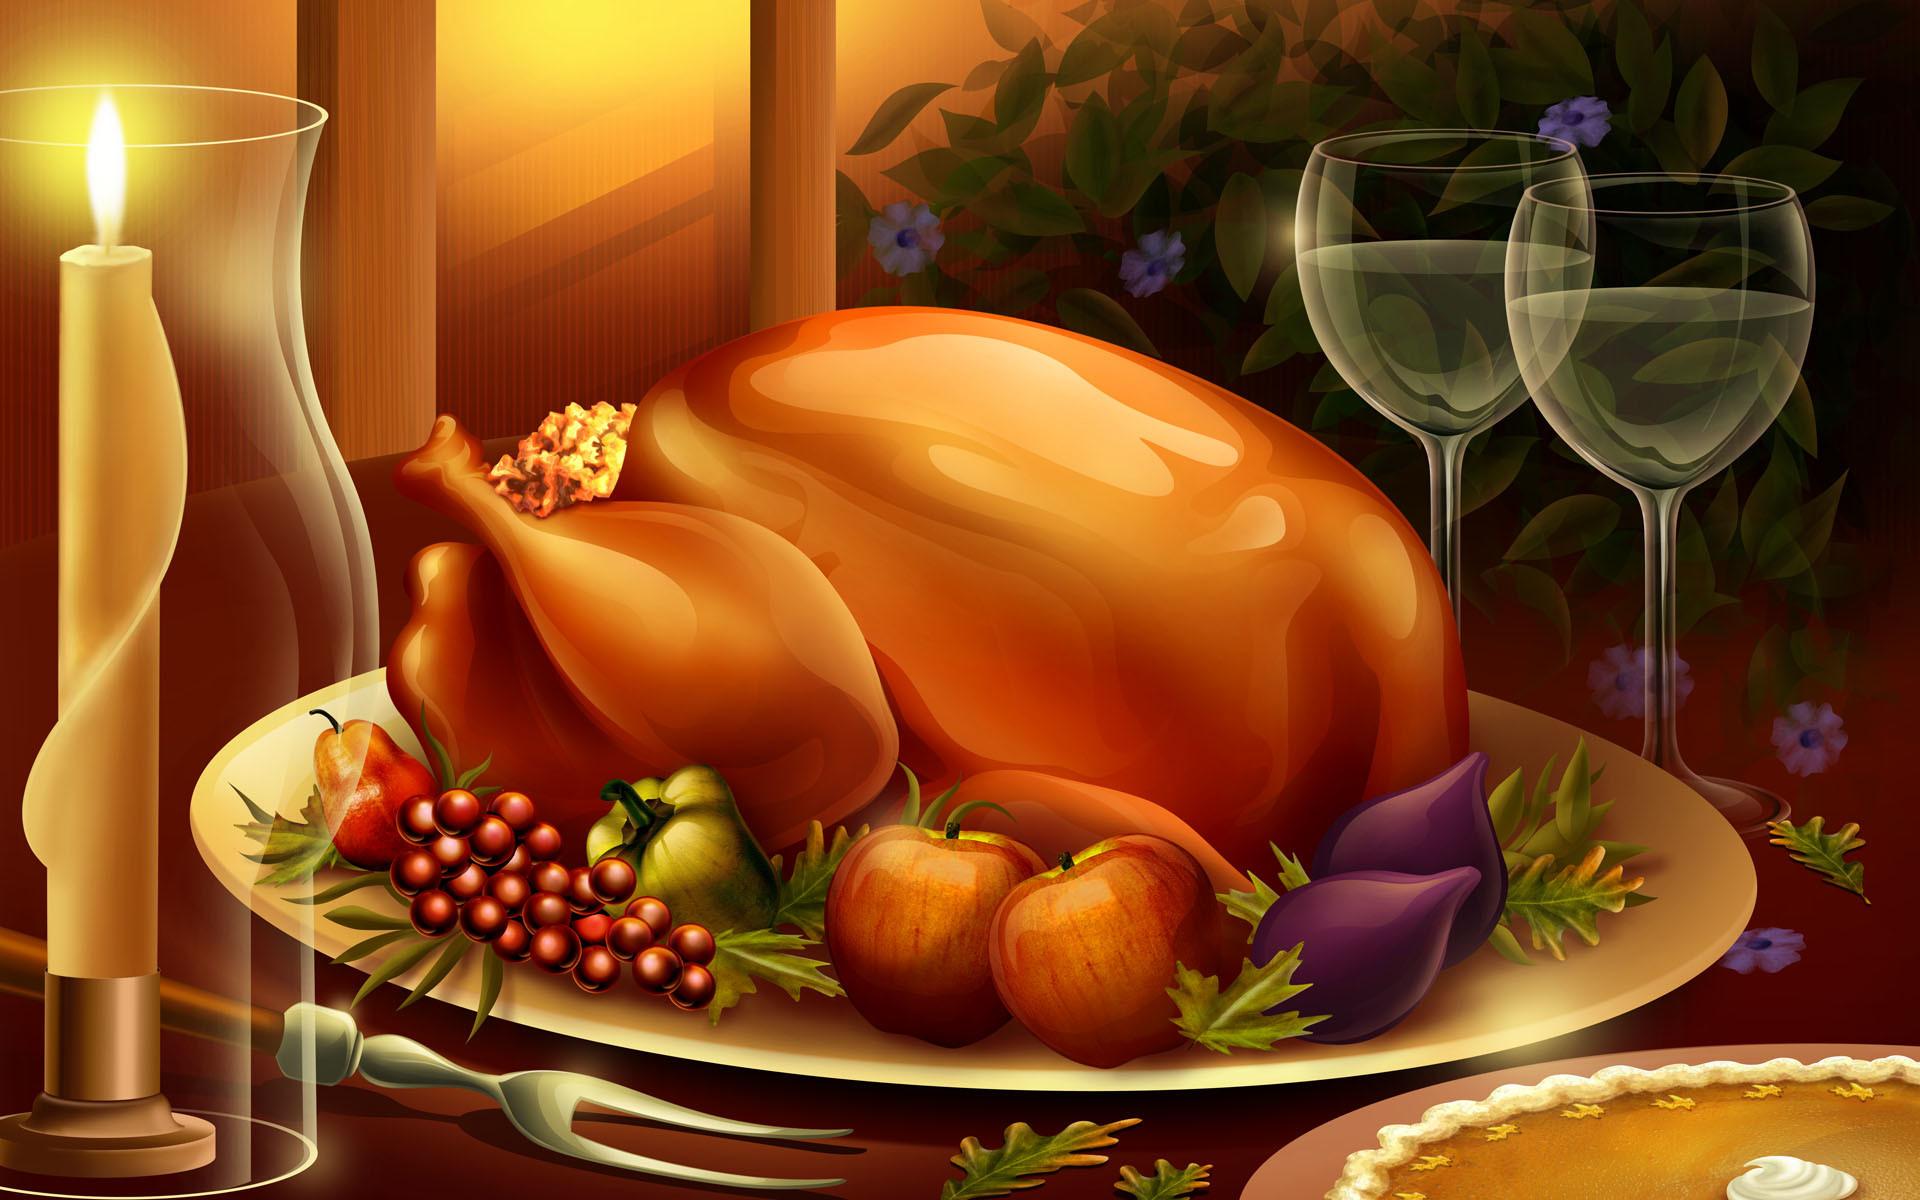 Cartoon Happy ThanksGiving Photos | Thanksgiving Ideas Hd Wallpaper